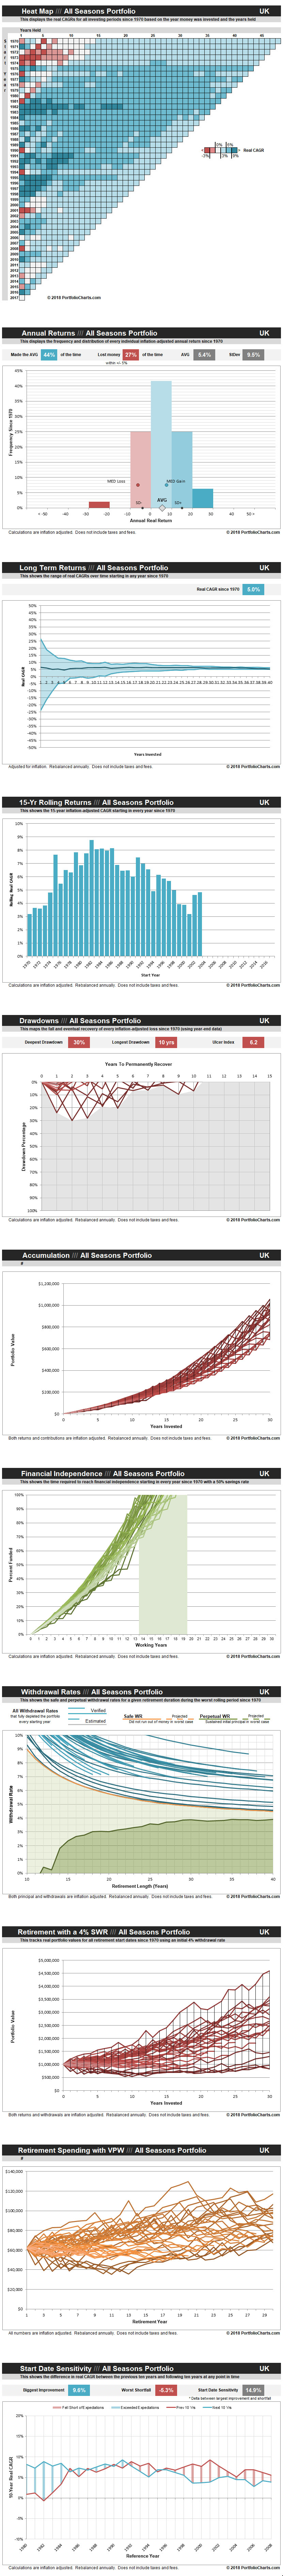 all-seasons-portfolio-UK-20180508